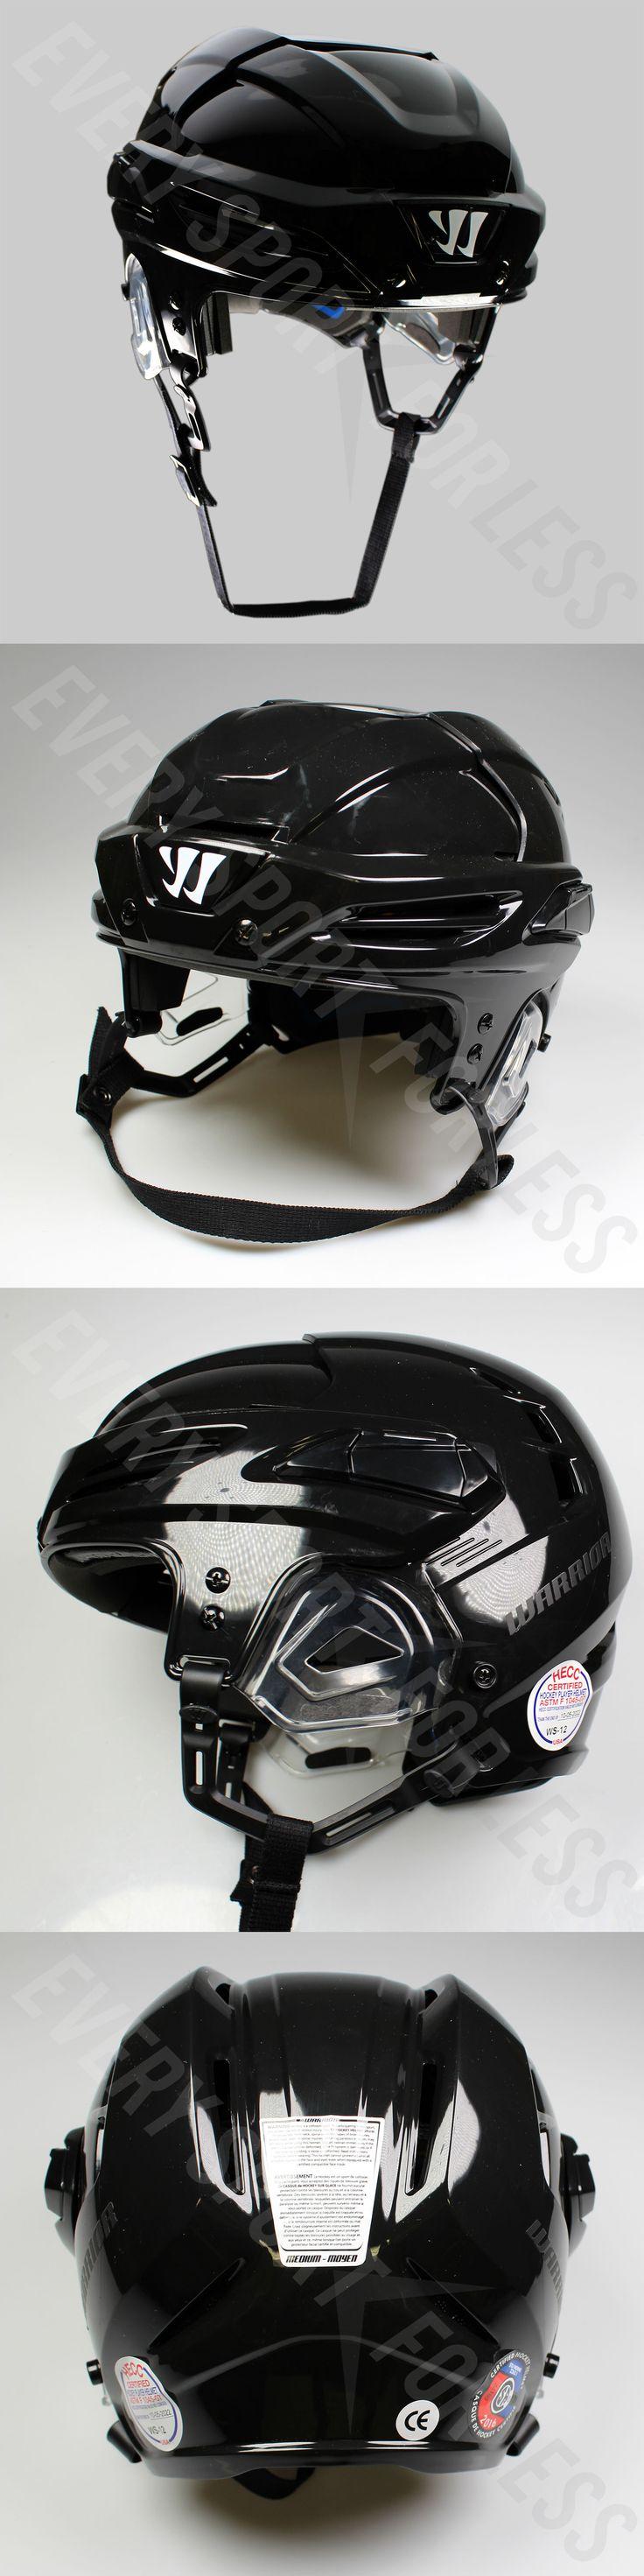 Helmets 20854: Warrior Sports Adult Covert Px+ Hockey Helmet Pxph6 - Black (New) -> BUY IT NOW ONLY: $179.99 on eBay!